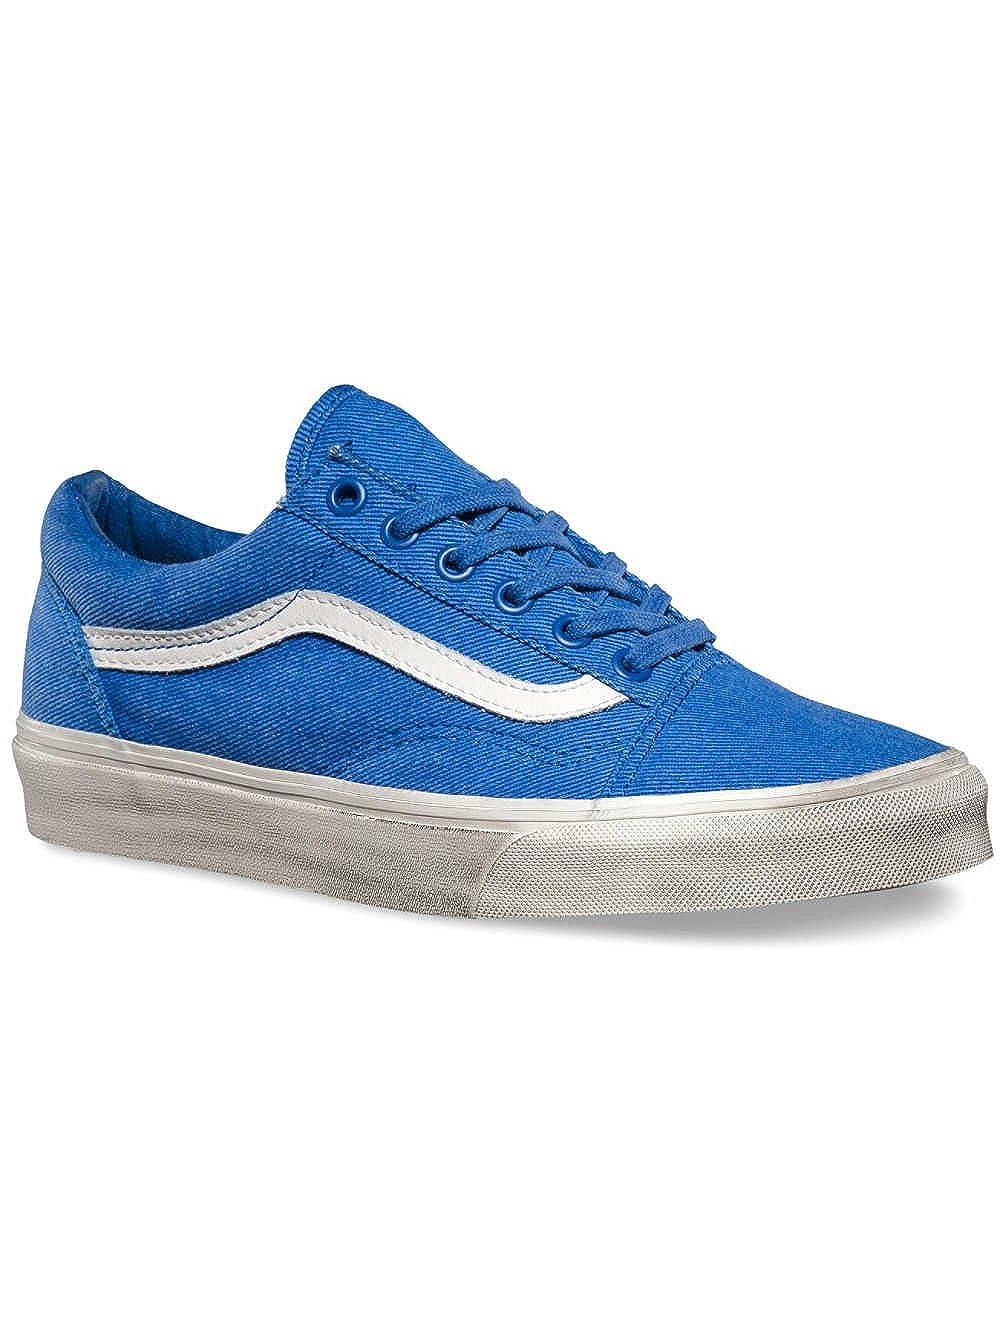 bleu - (overwashed) nautical bleu Vans UA Old Skool, paniers Basses Homme